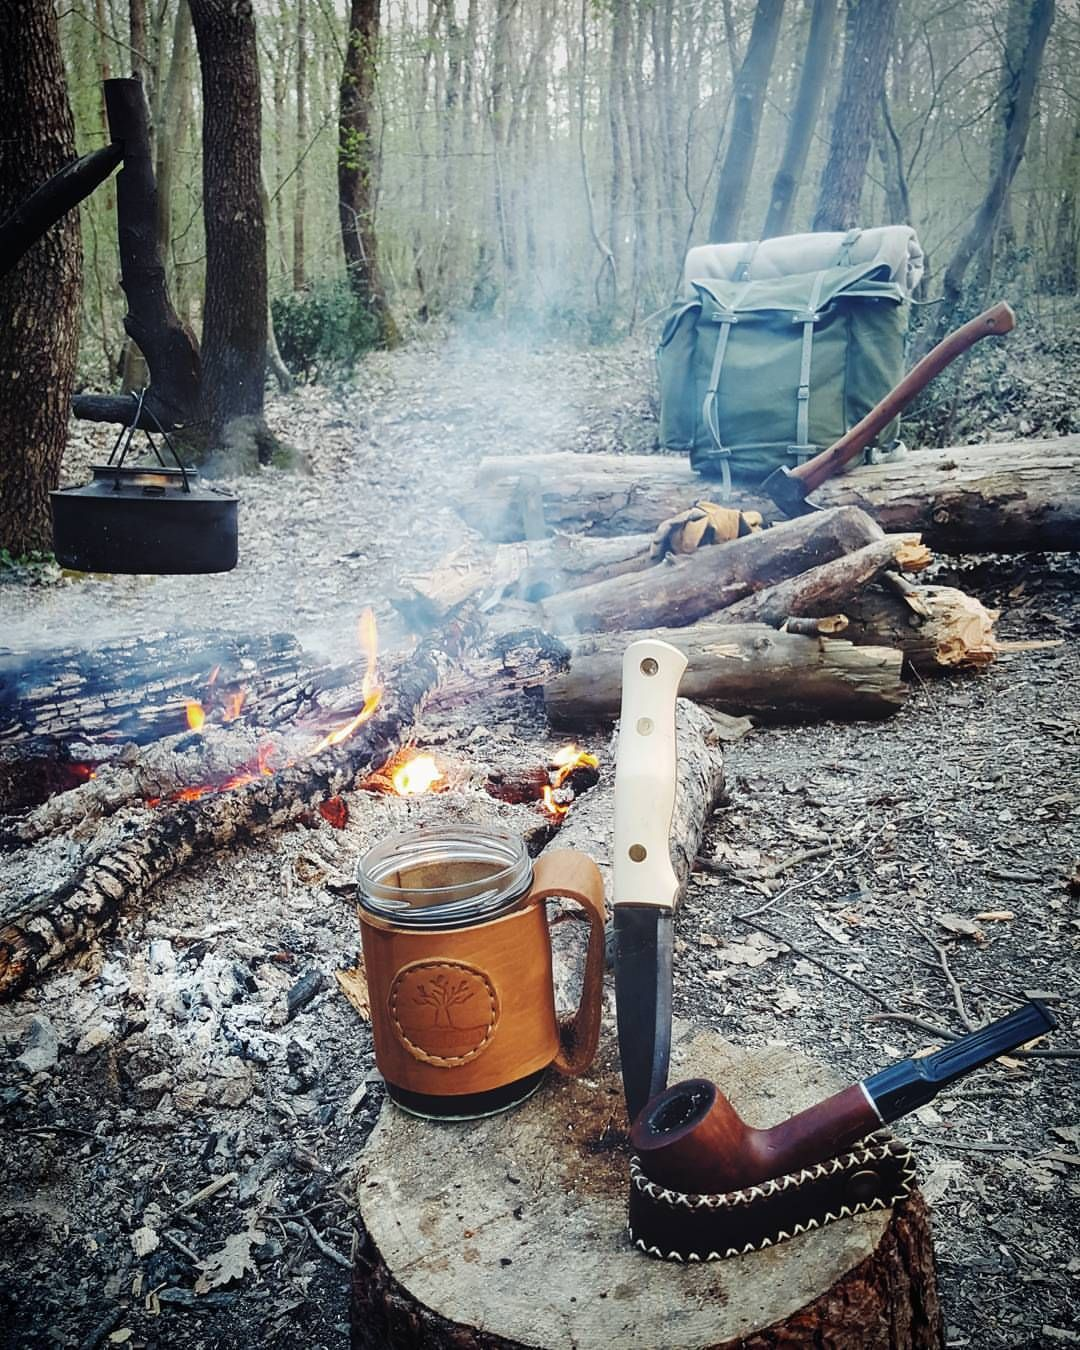 Bushcraft Survival Skills: Pin By Thomas Brooks On Survival